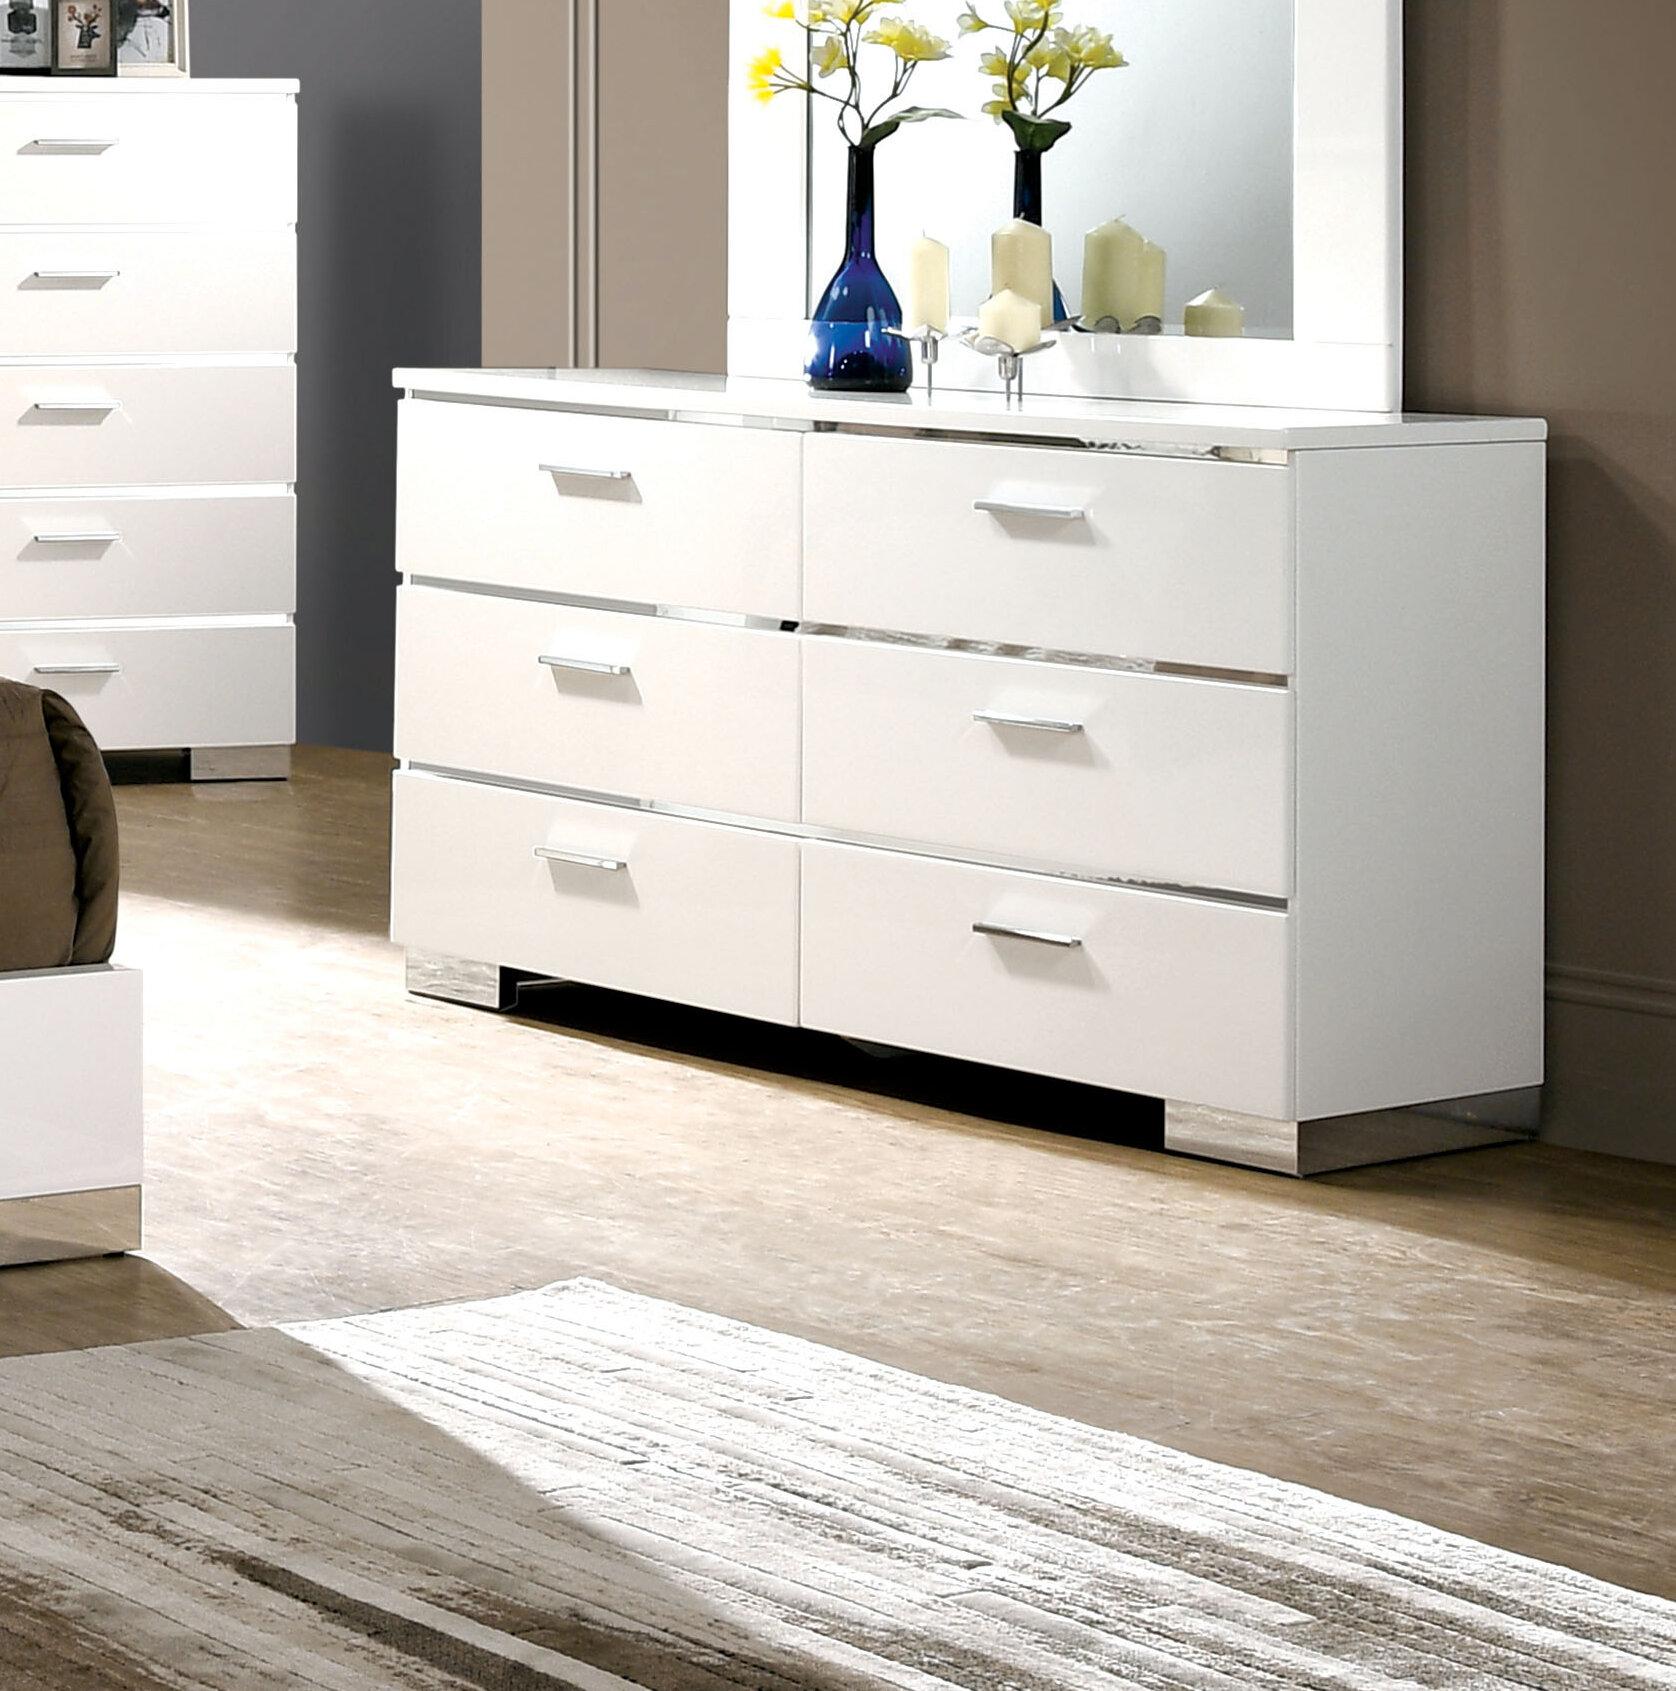 Brayden Studio Ricka 6 Drawer Double Dresser With Mirror Reviews Wayfair